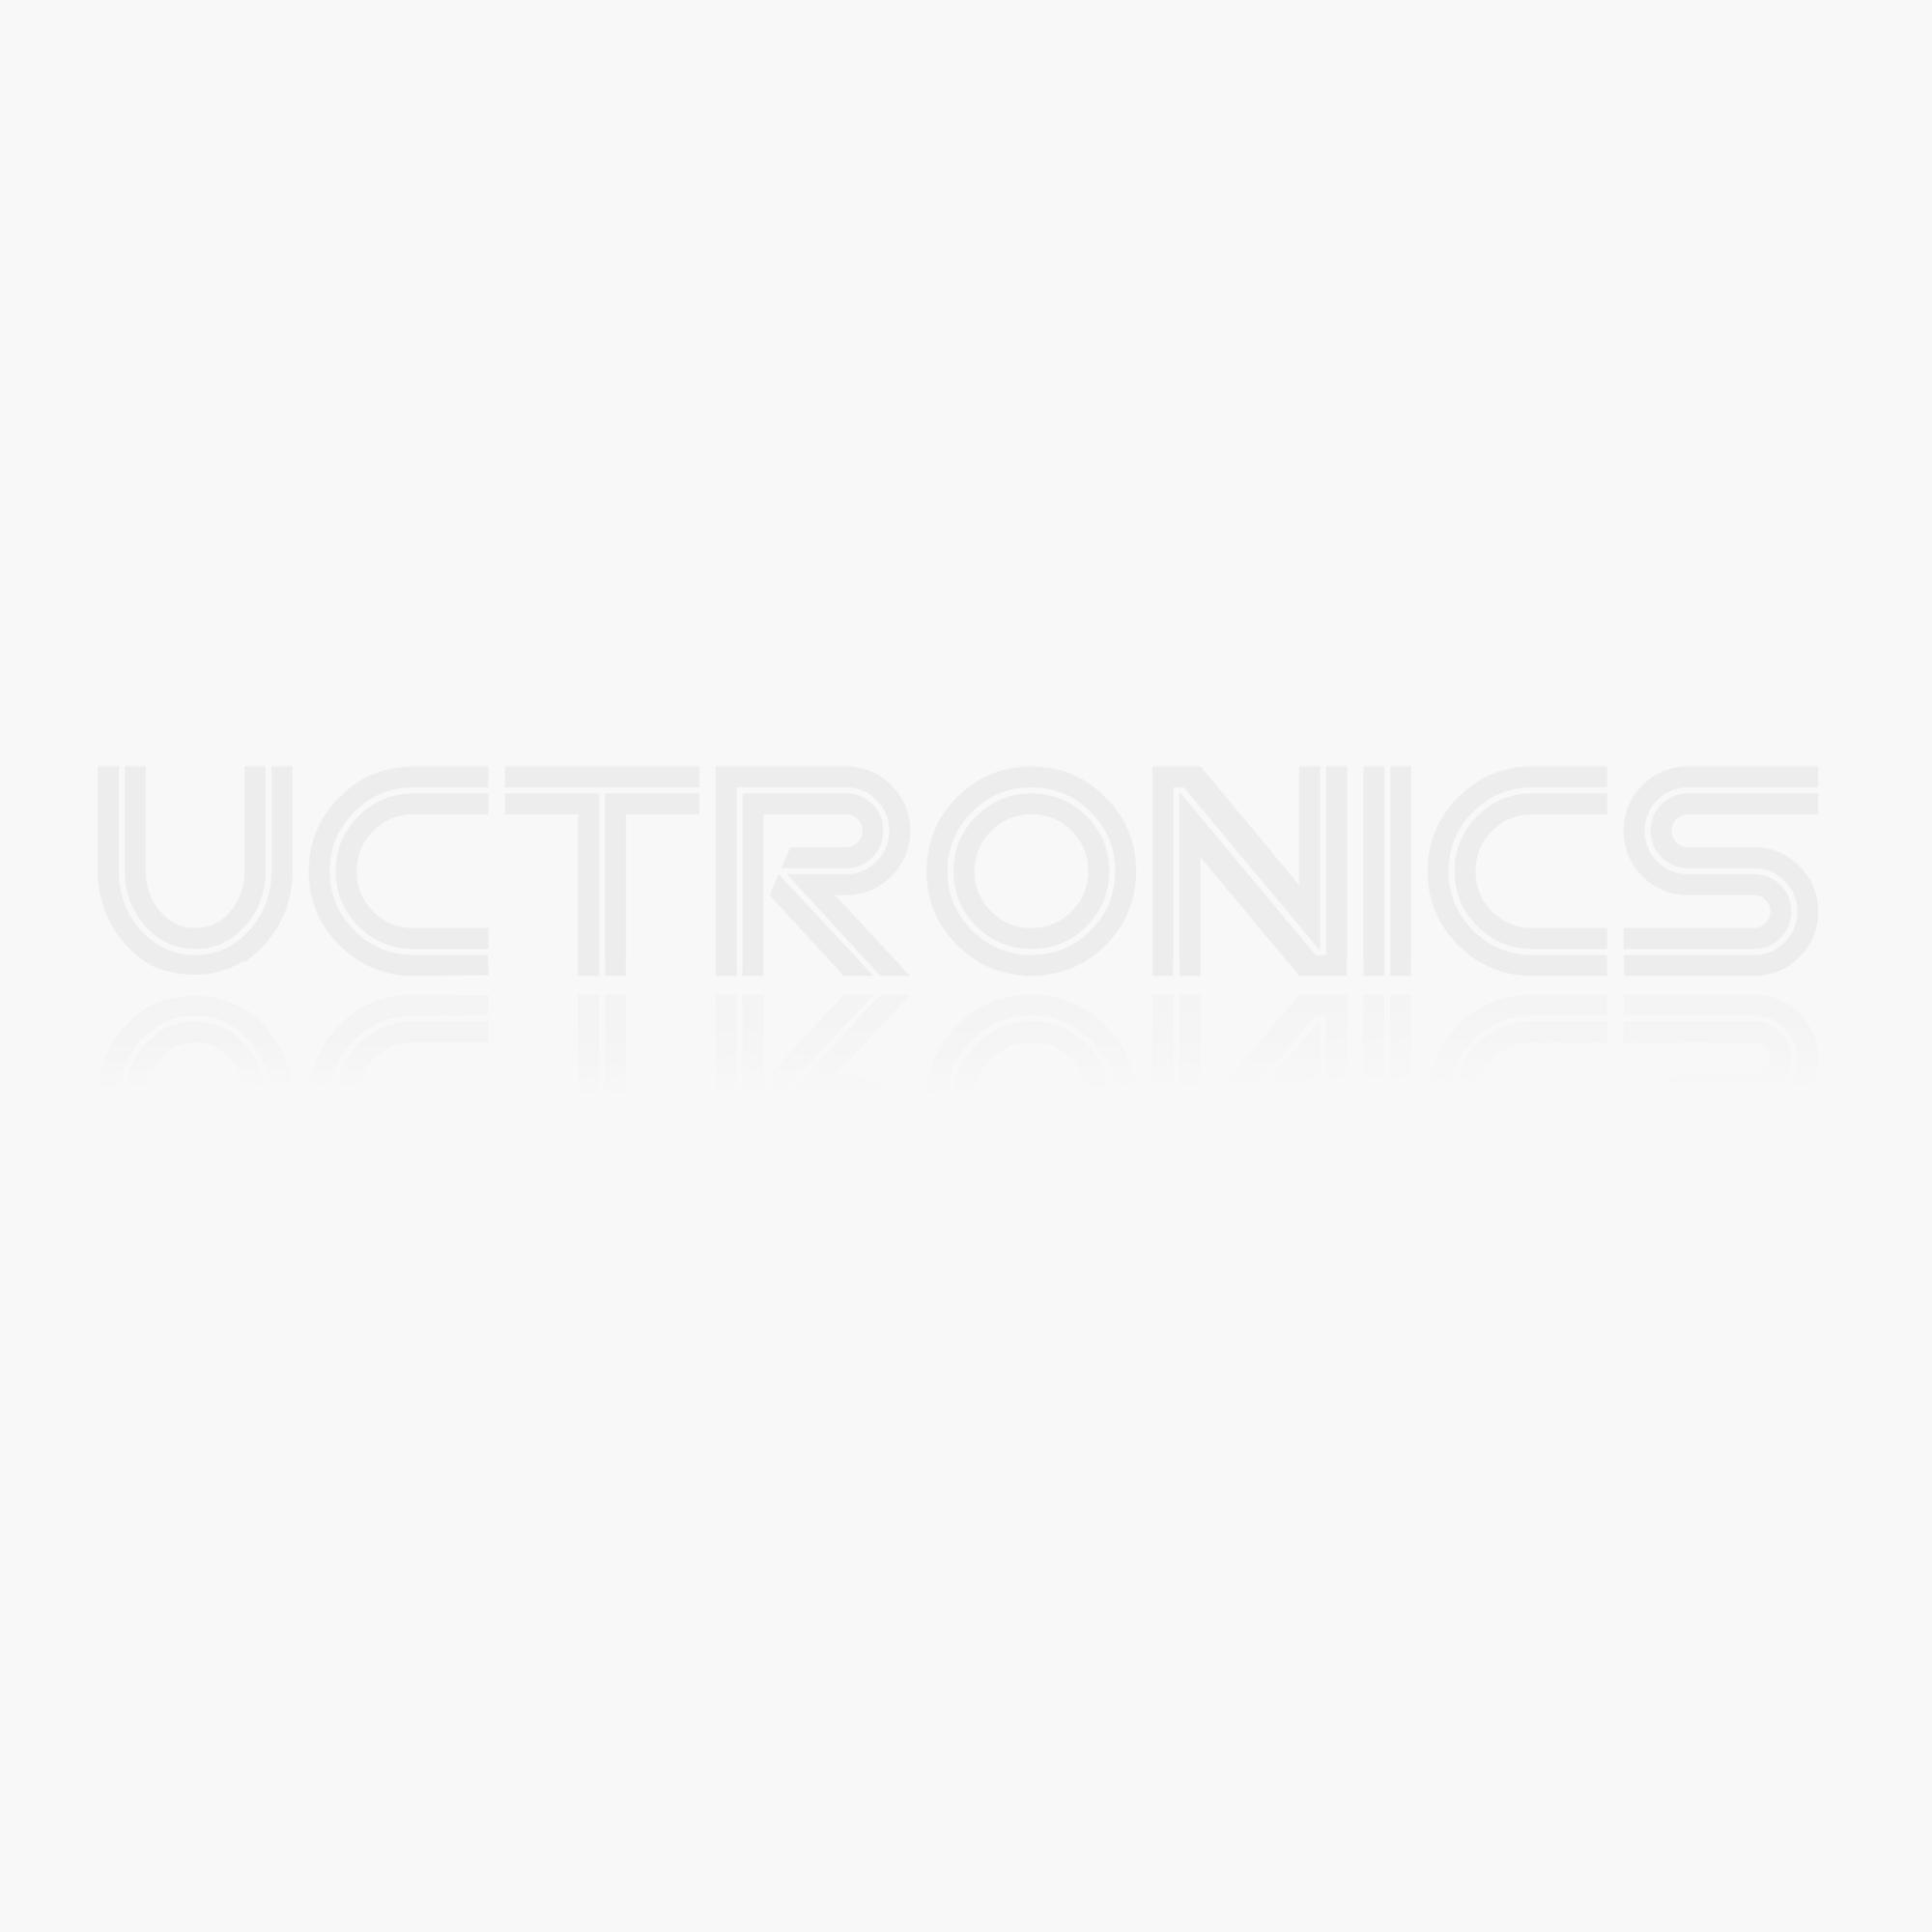 Arducam CC3200 UNO DIY Wifi Portable Security Spy Ghost Hunter Camera Starter Kit